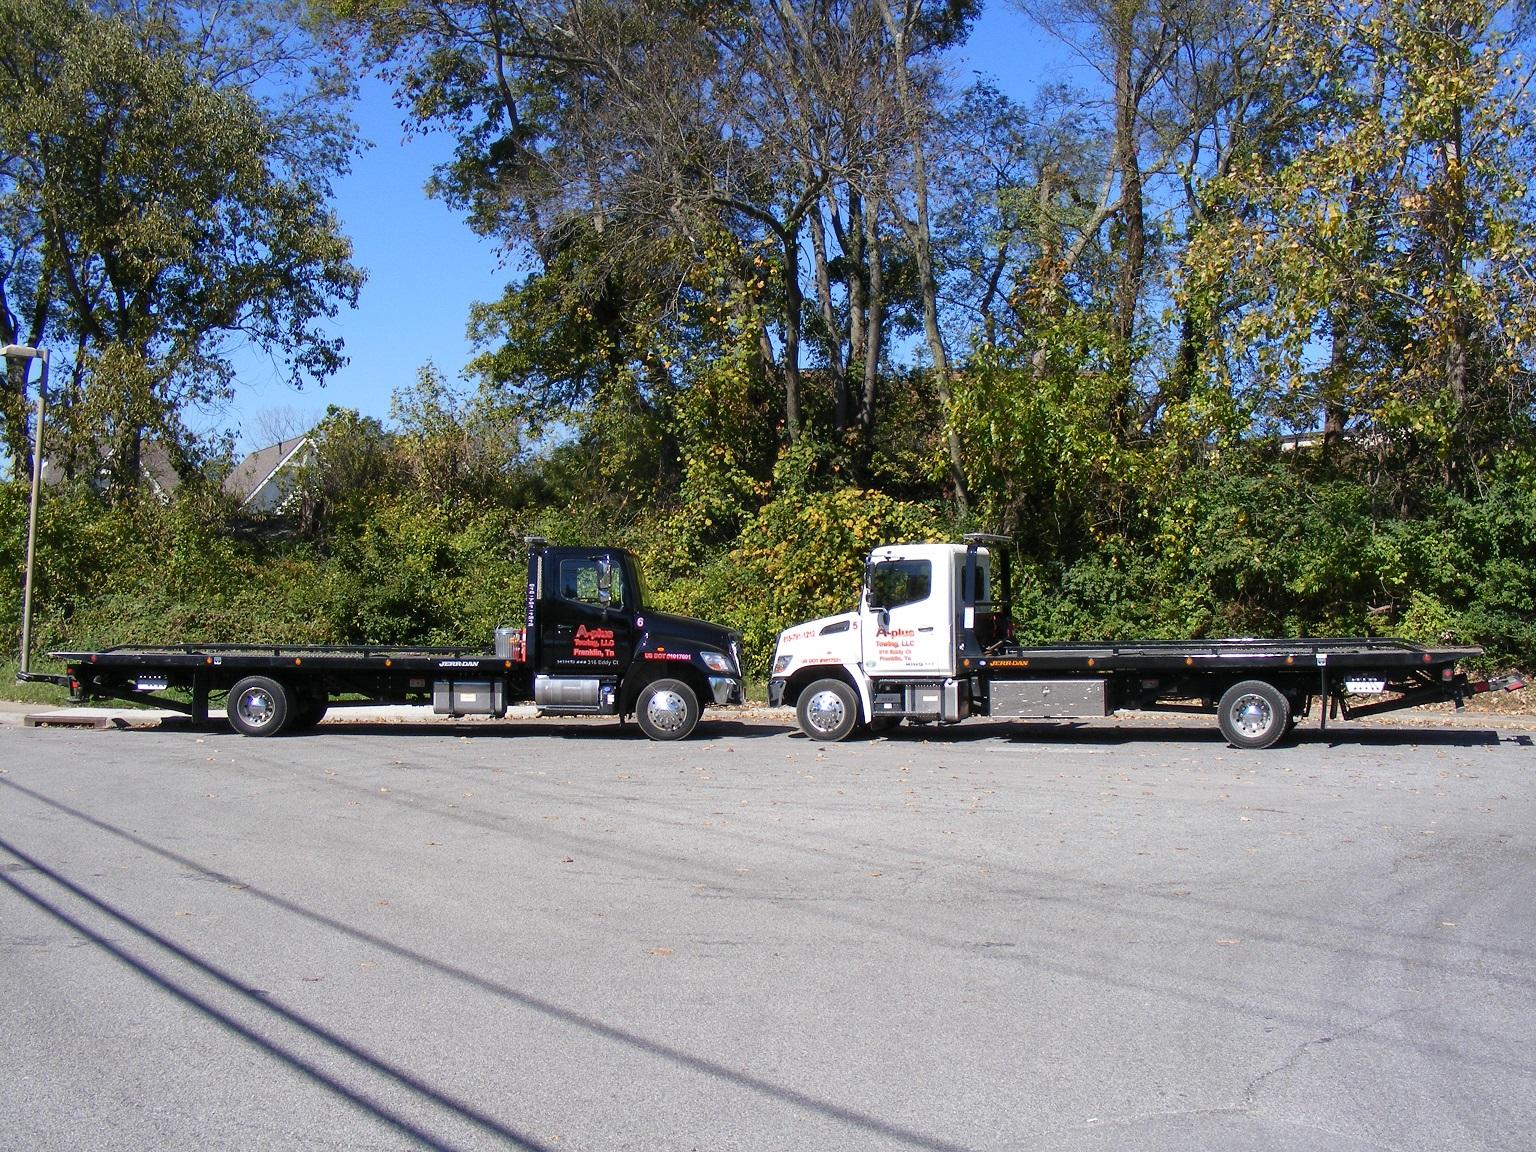 a-plus-towing-tire-changes-a